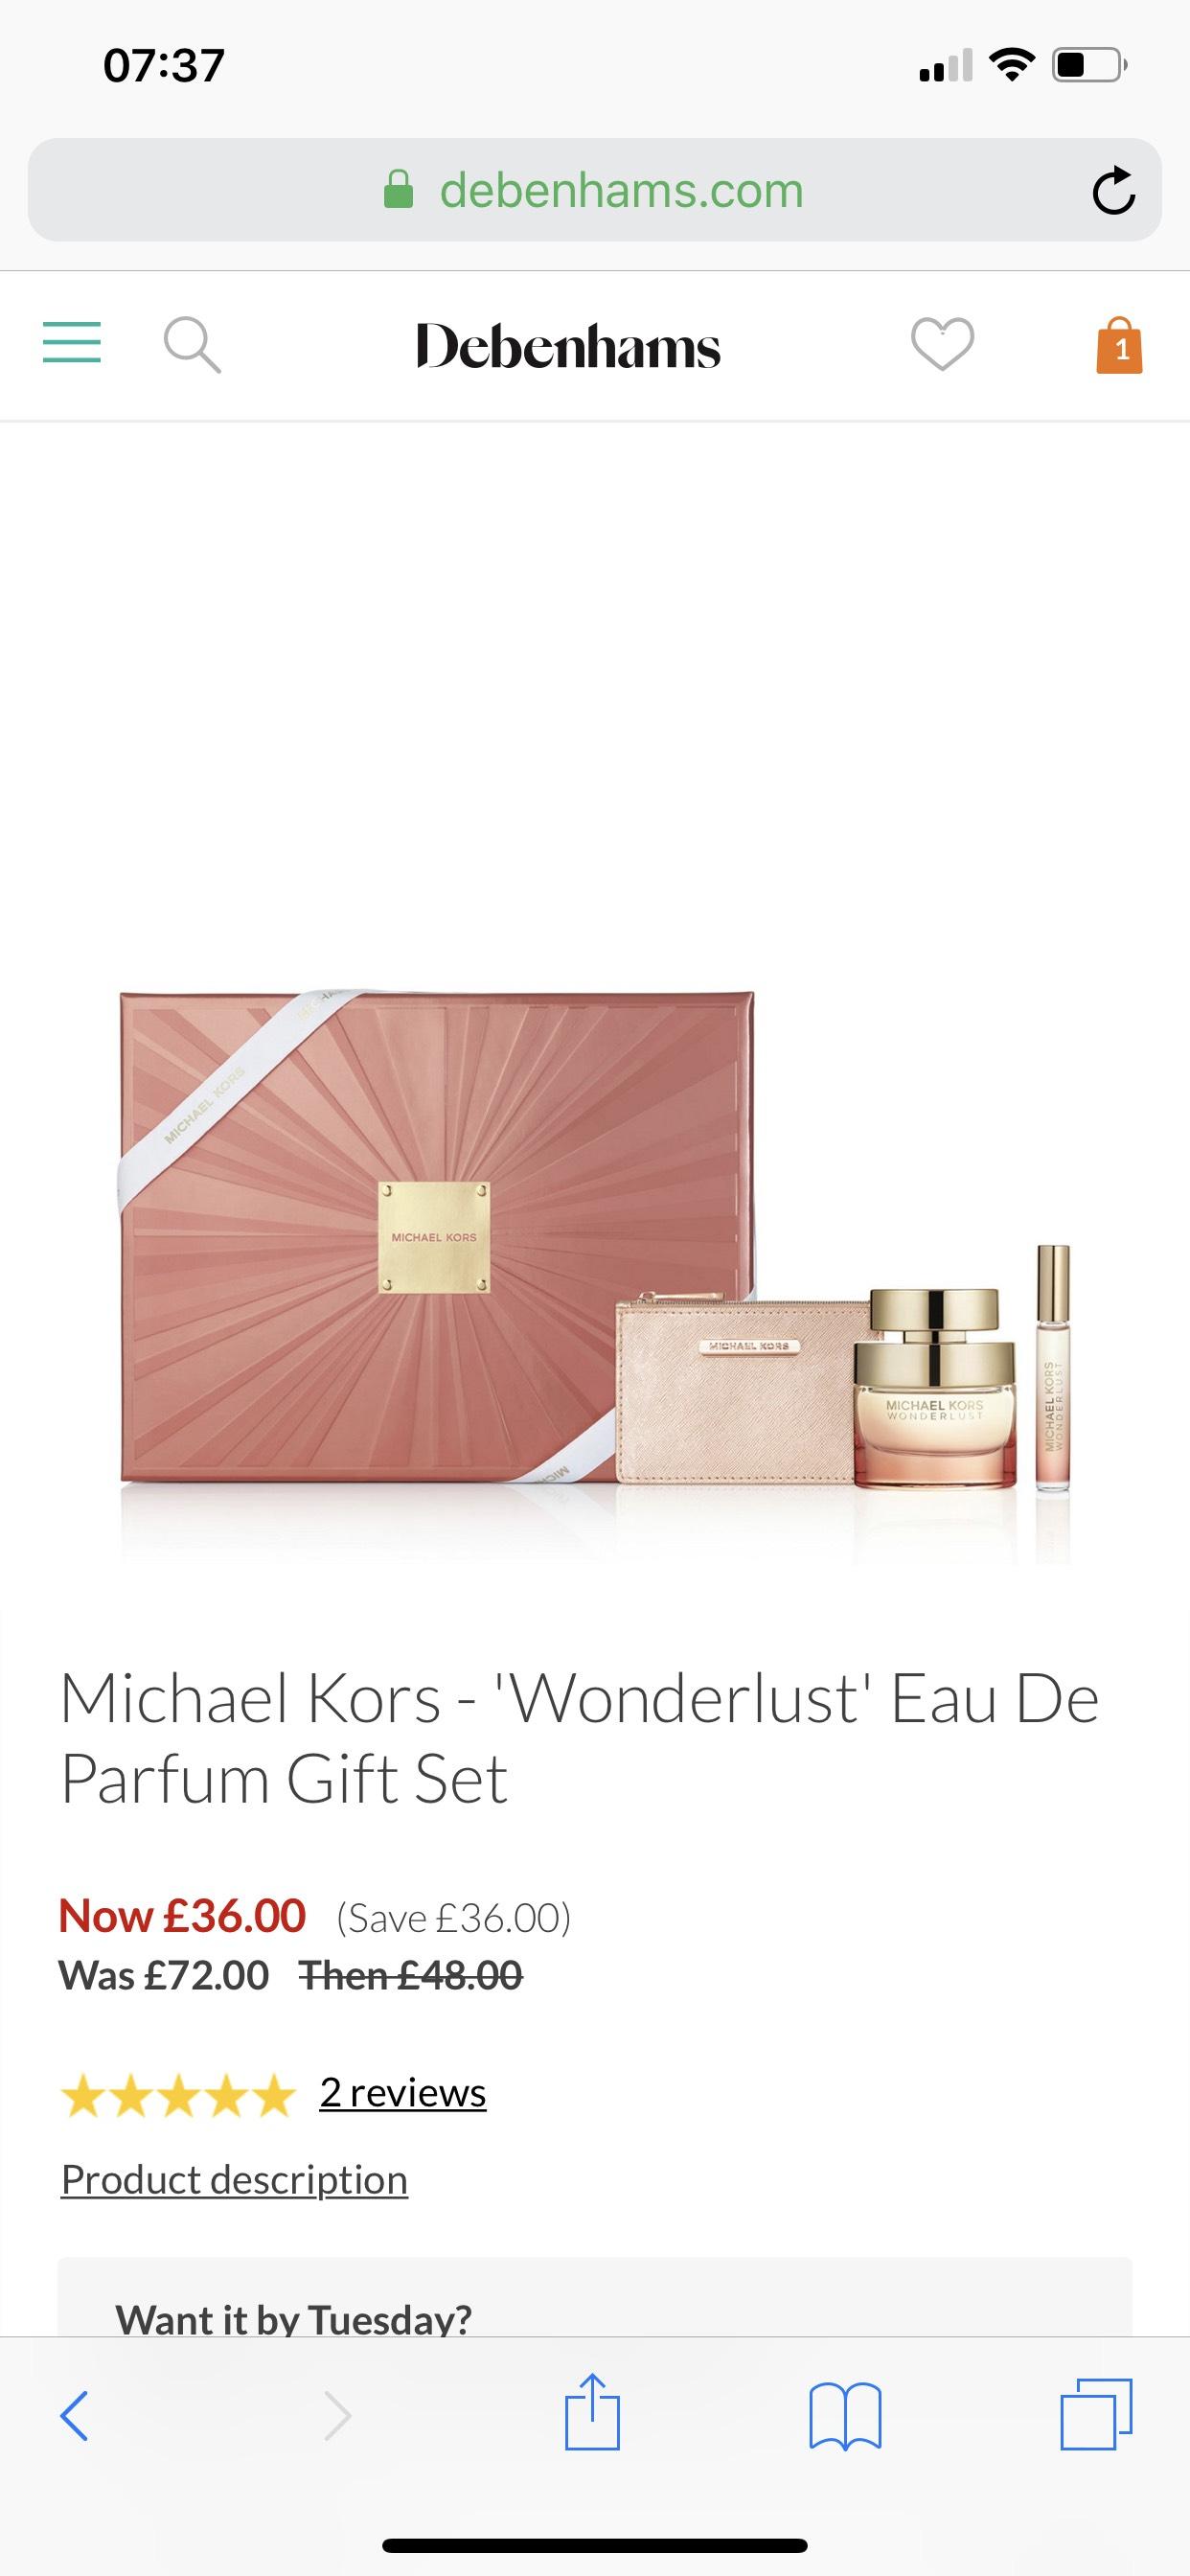 7d8e0cf3622f Michael Kors -  Wonderlust  Eau De Parfum Gift Set 50ml - £36 Debenhams